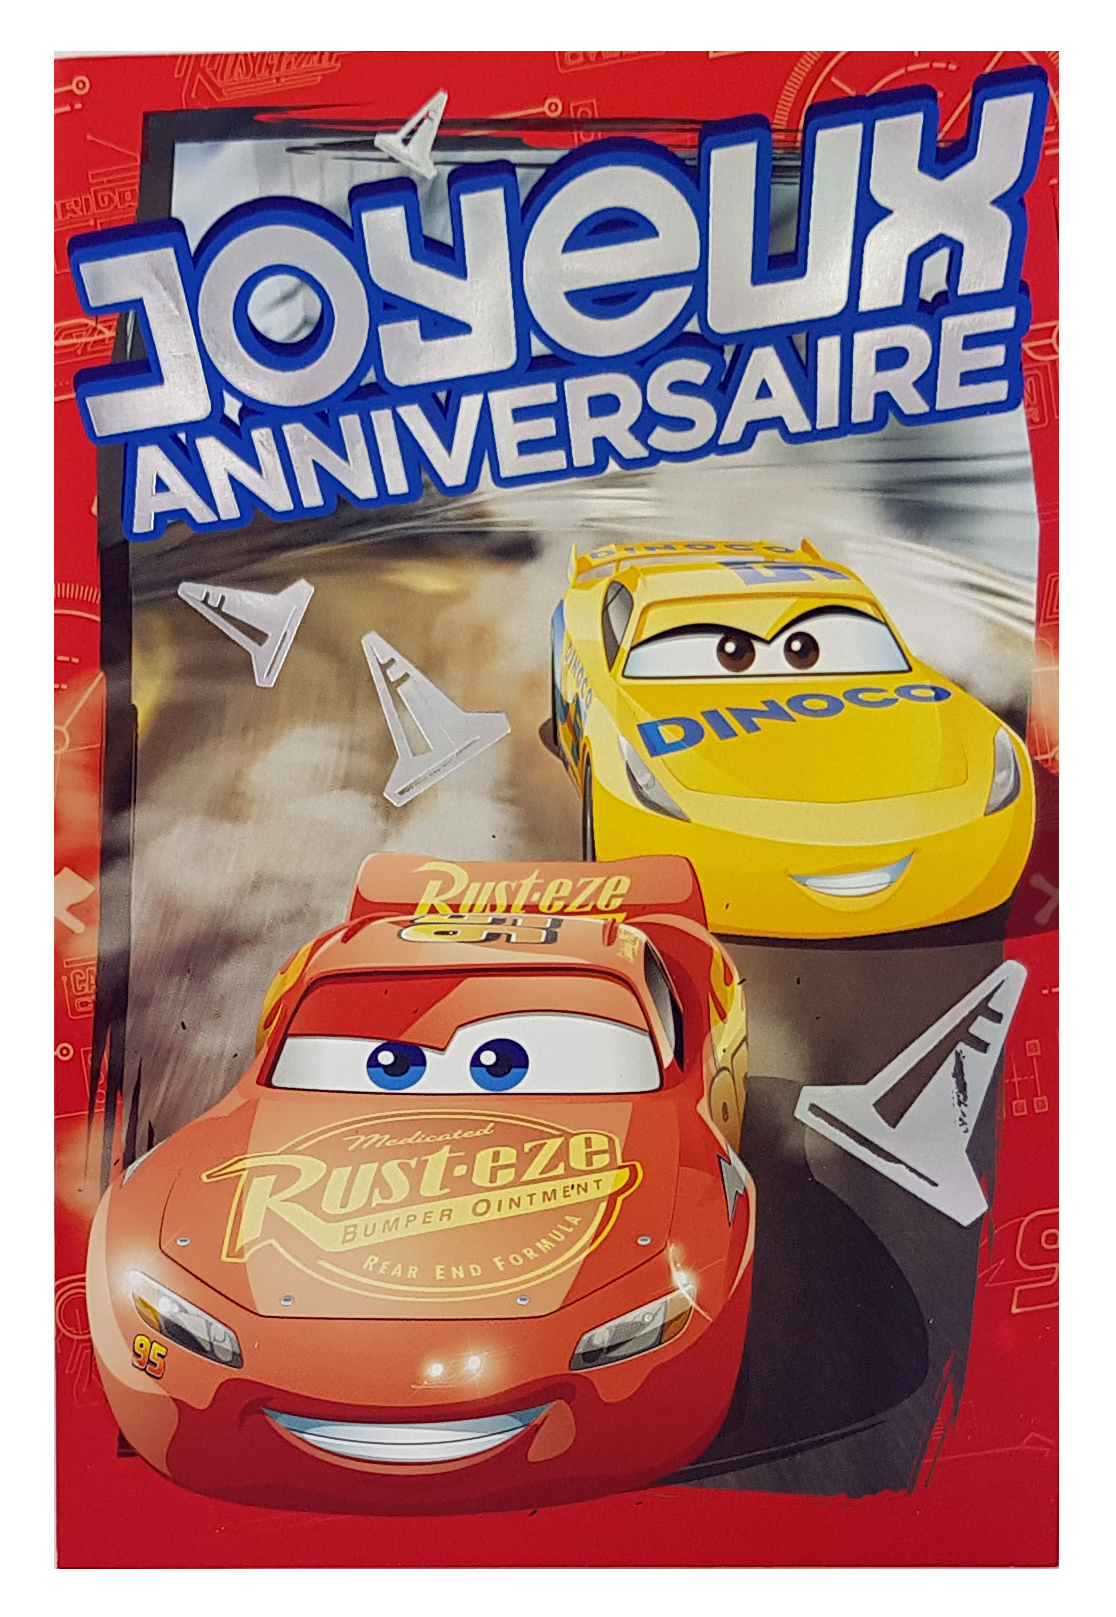 Carte de menu anniversaire Cars Disney Pixar-Flash McQueen Rust.eze, Cruz Dinoco. Réf. 86